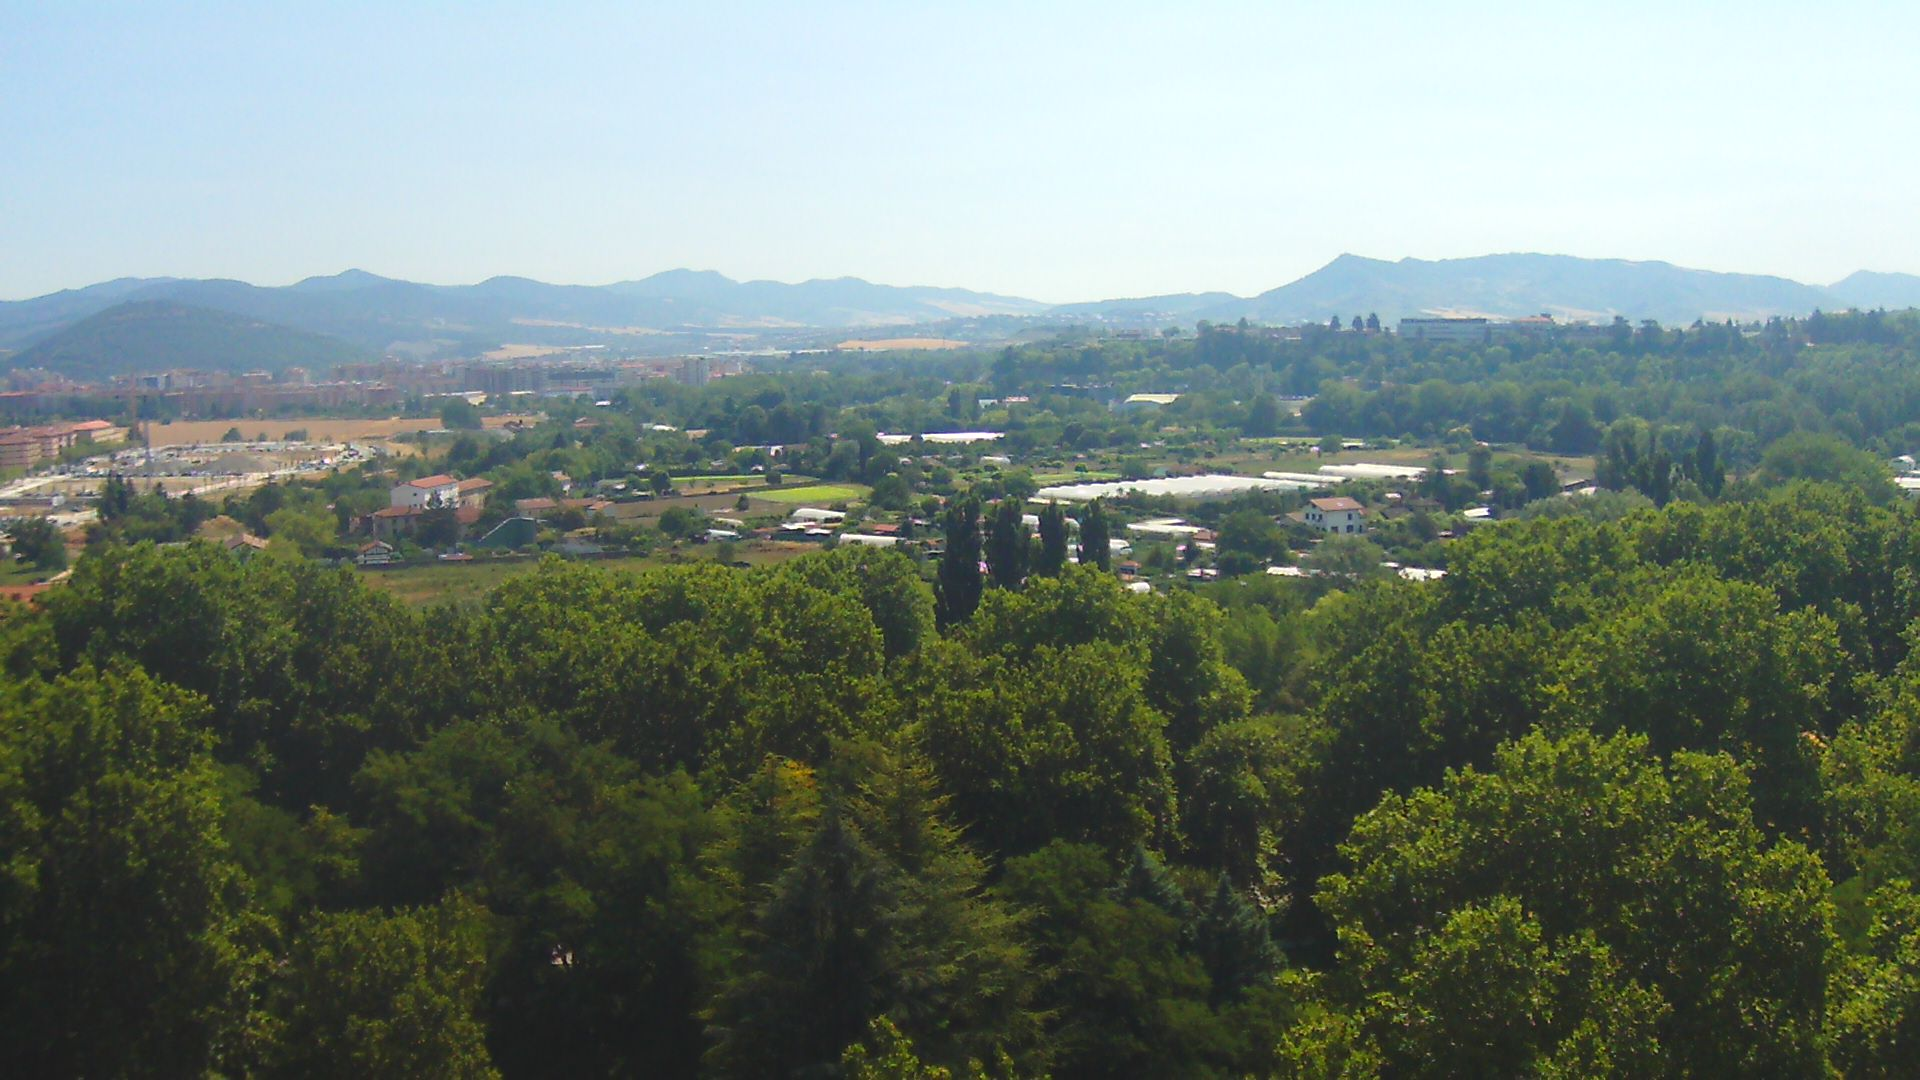 Pamplona So. 11:46